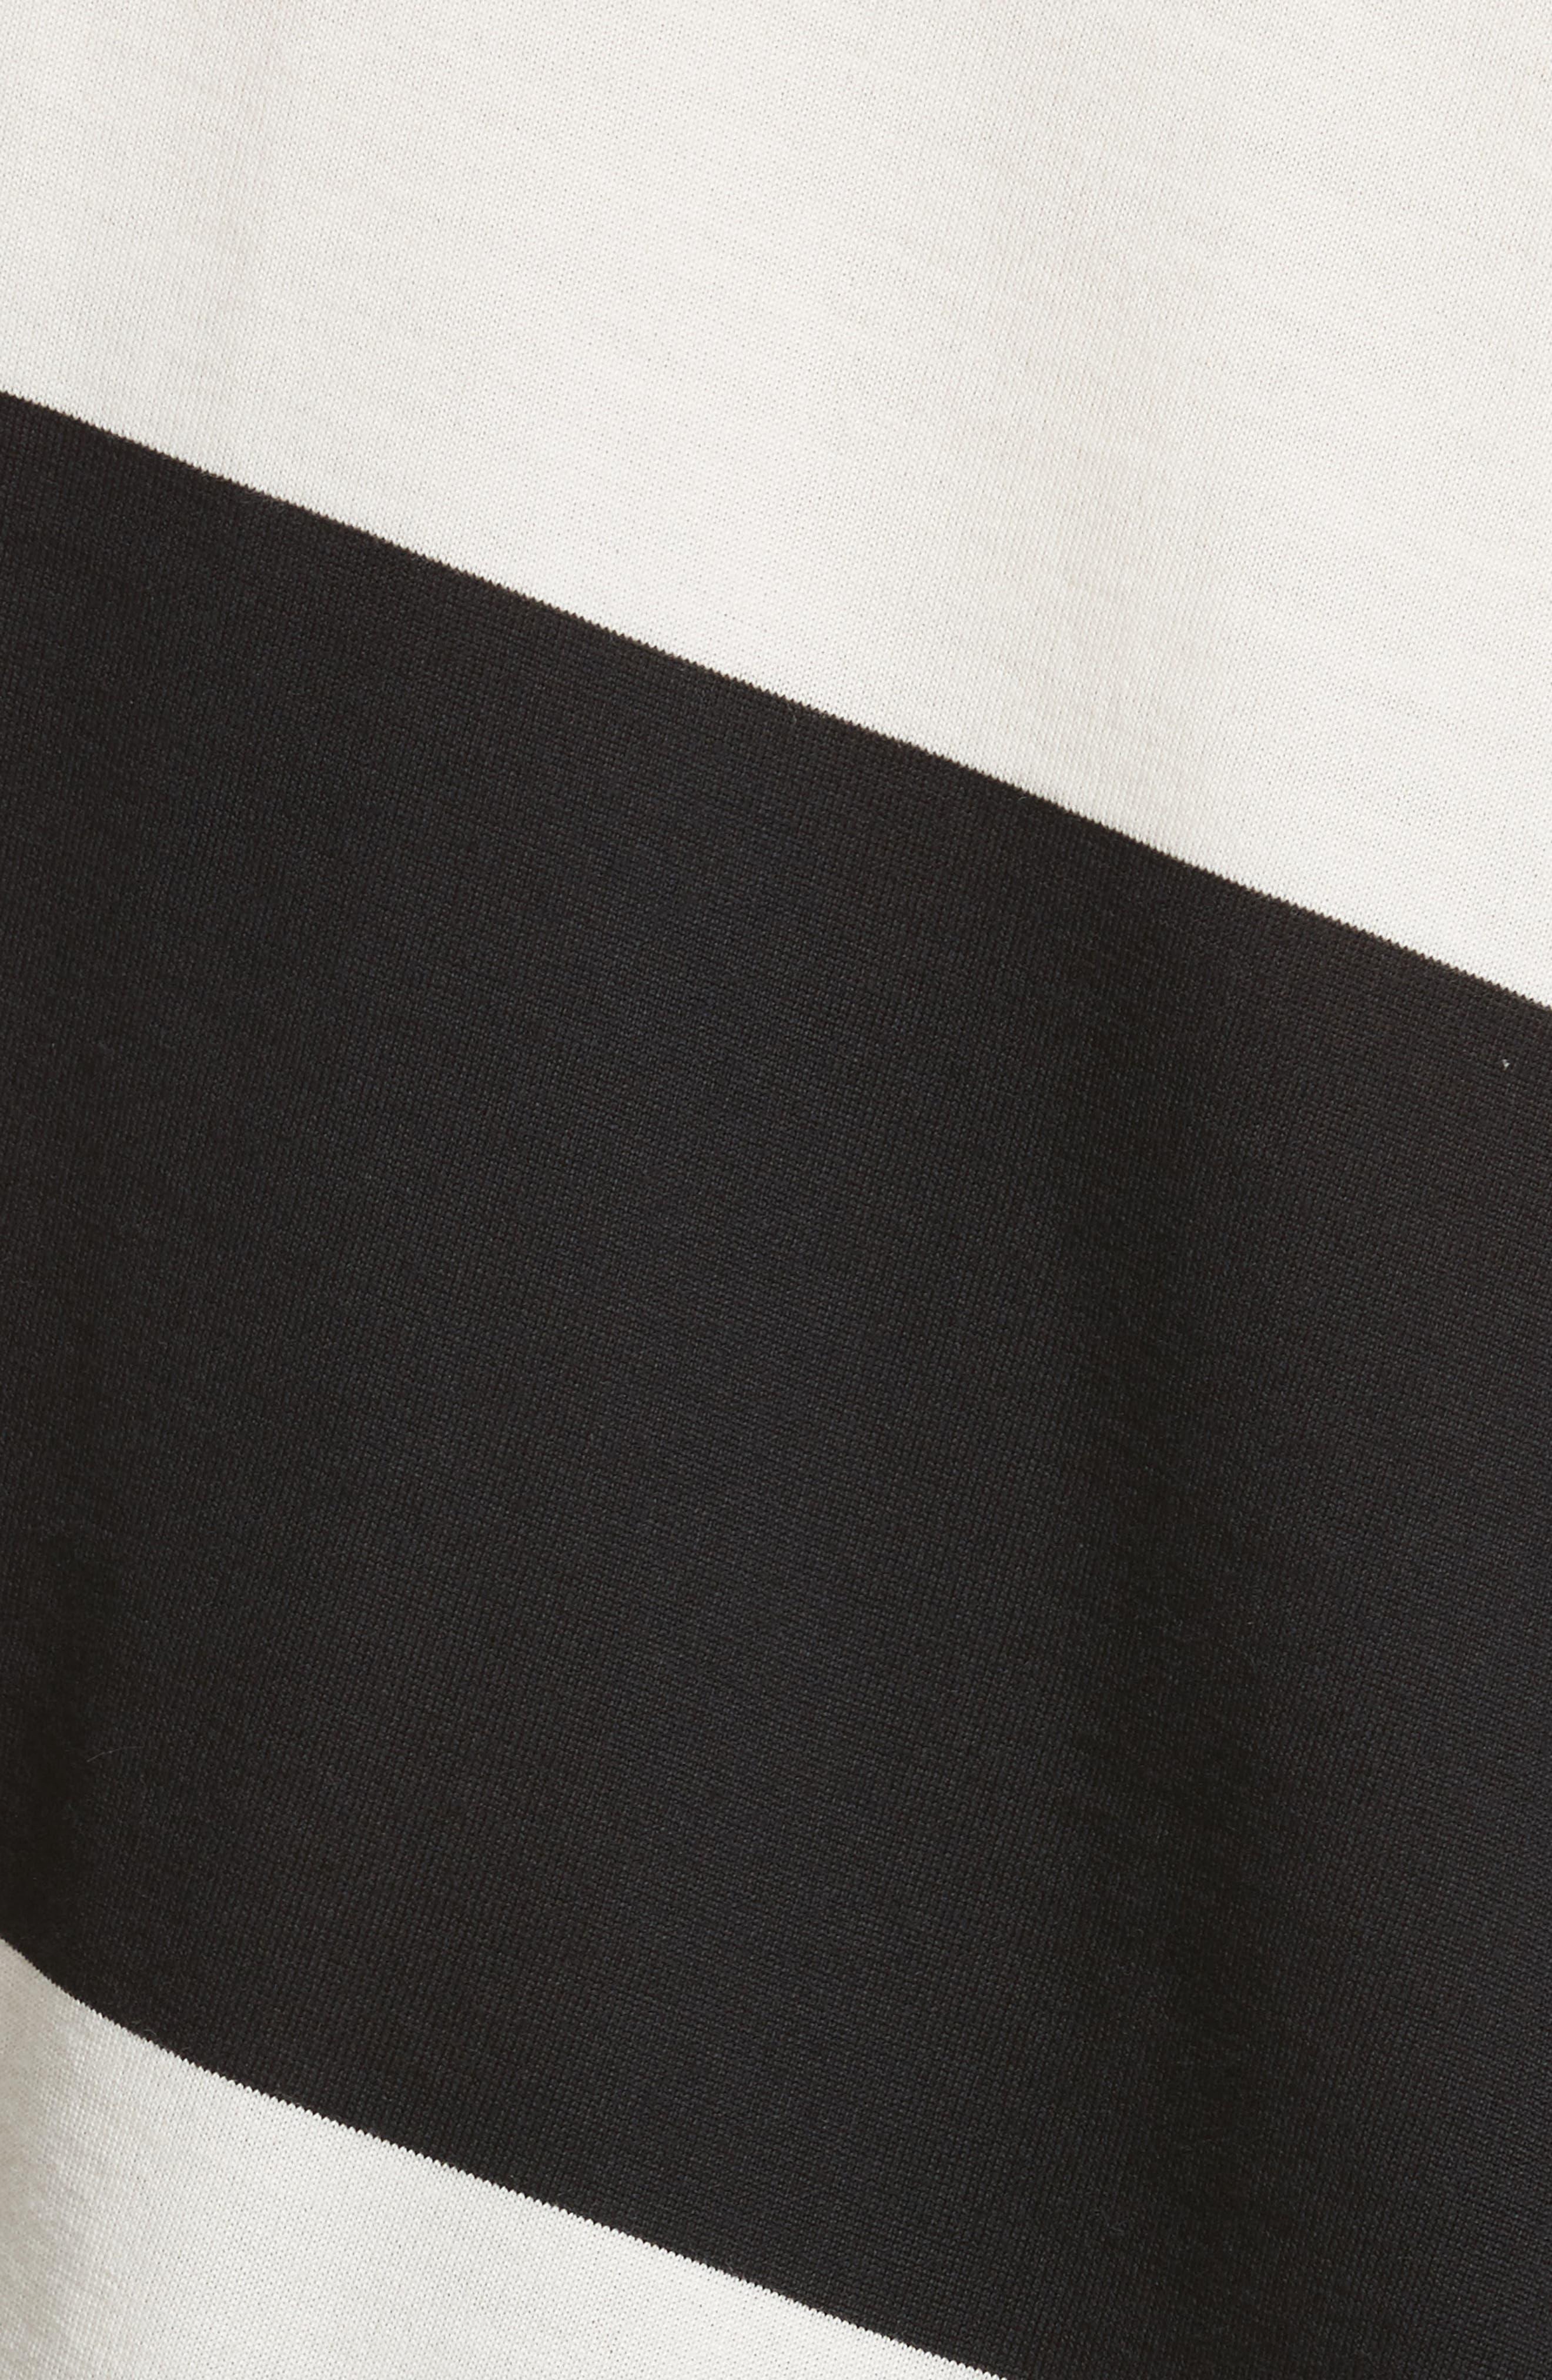 Bicolor Stripe Merino Wool Blend Sweater,                             Alternate thumbnail 5, color,                             Black/ Off White/ Yellow